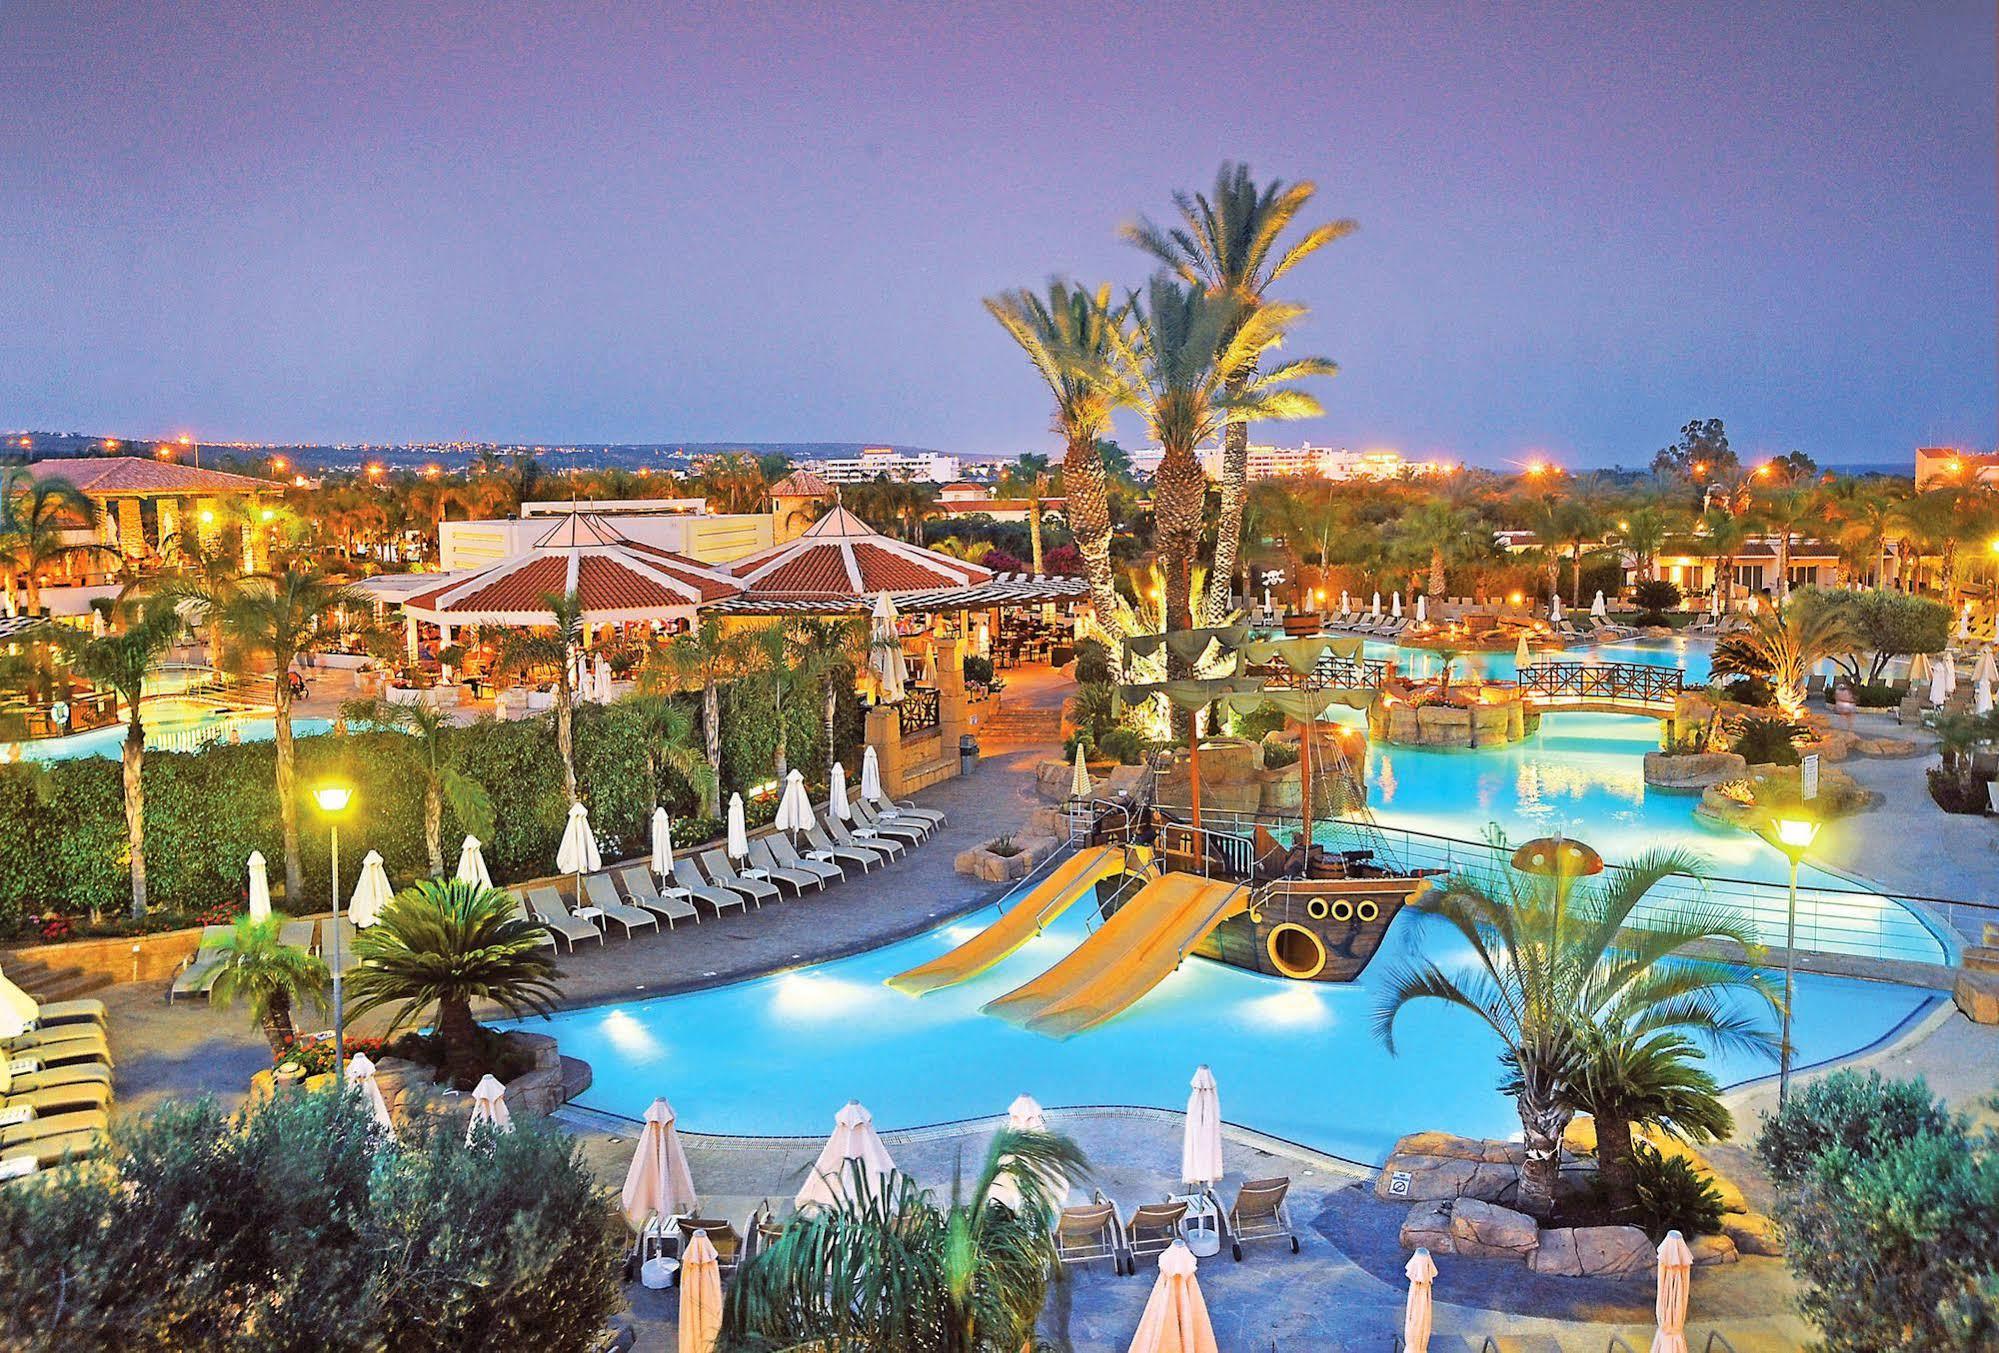 CYPR - LATO 2020: Olympic Lagoon Resort****, 11 dni (15-25.08.2020 r.), all inclusive: 9898,00 PLN/os. dorosła